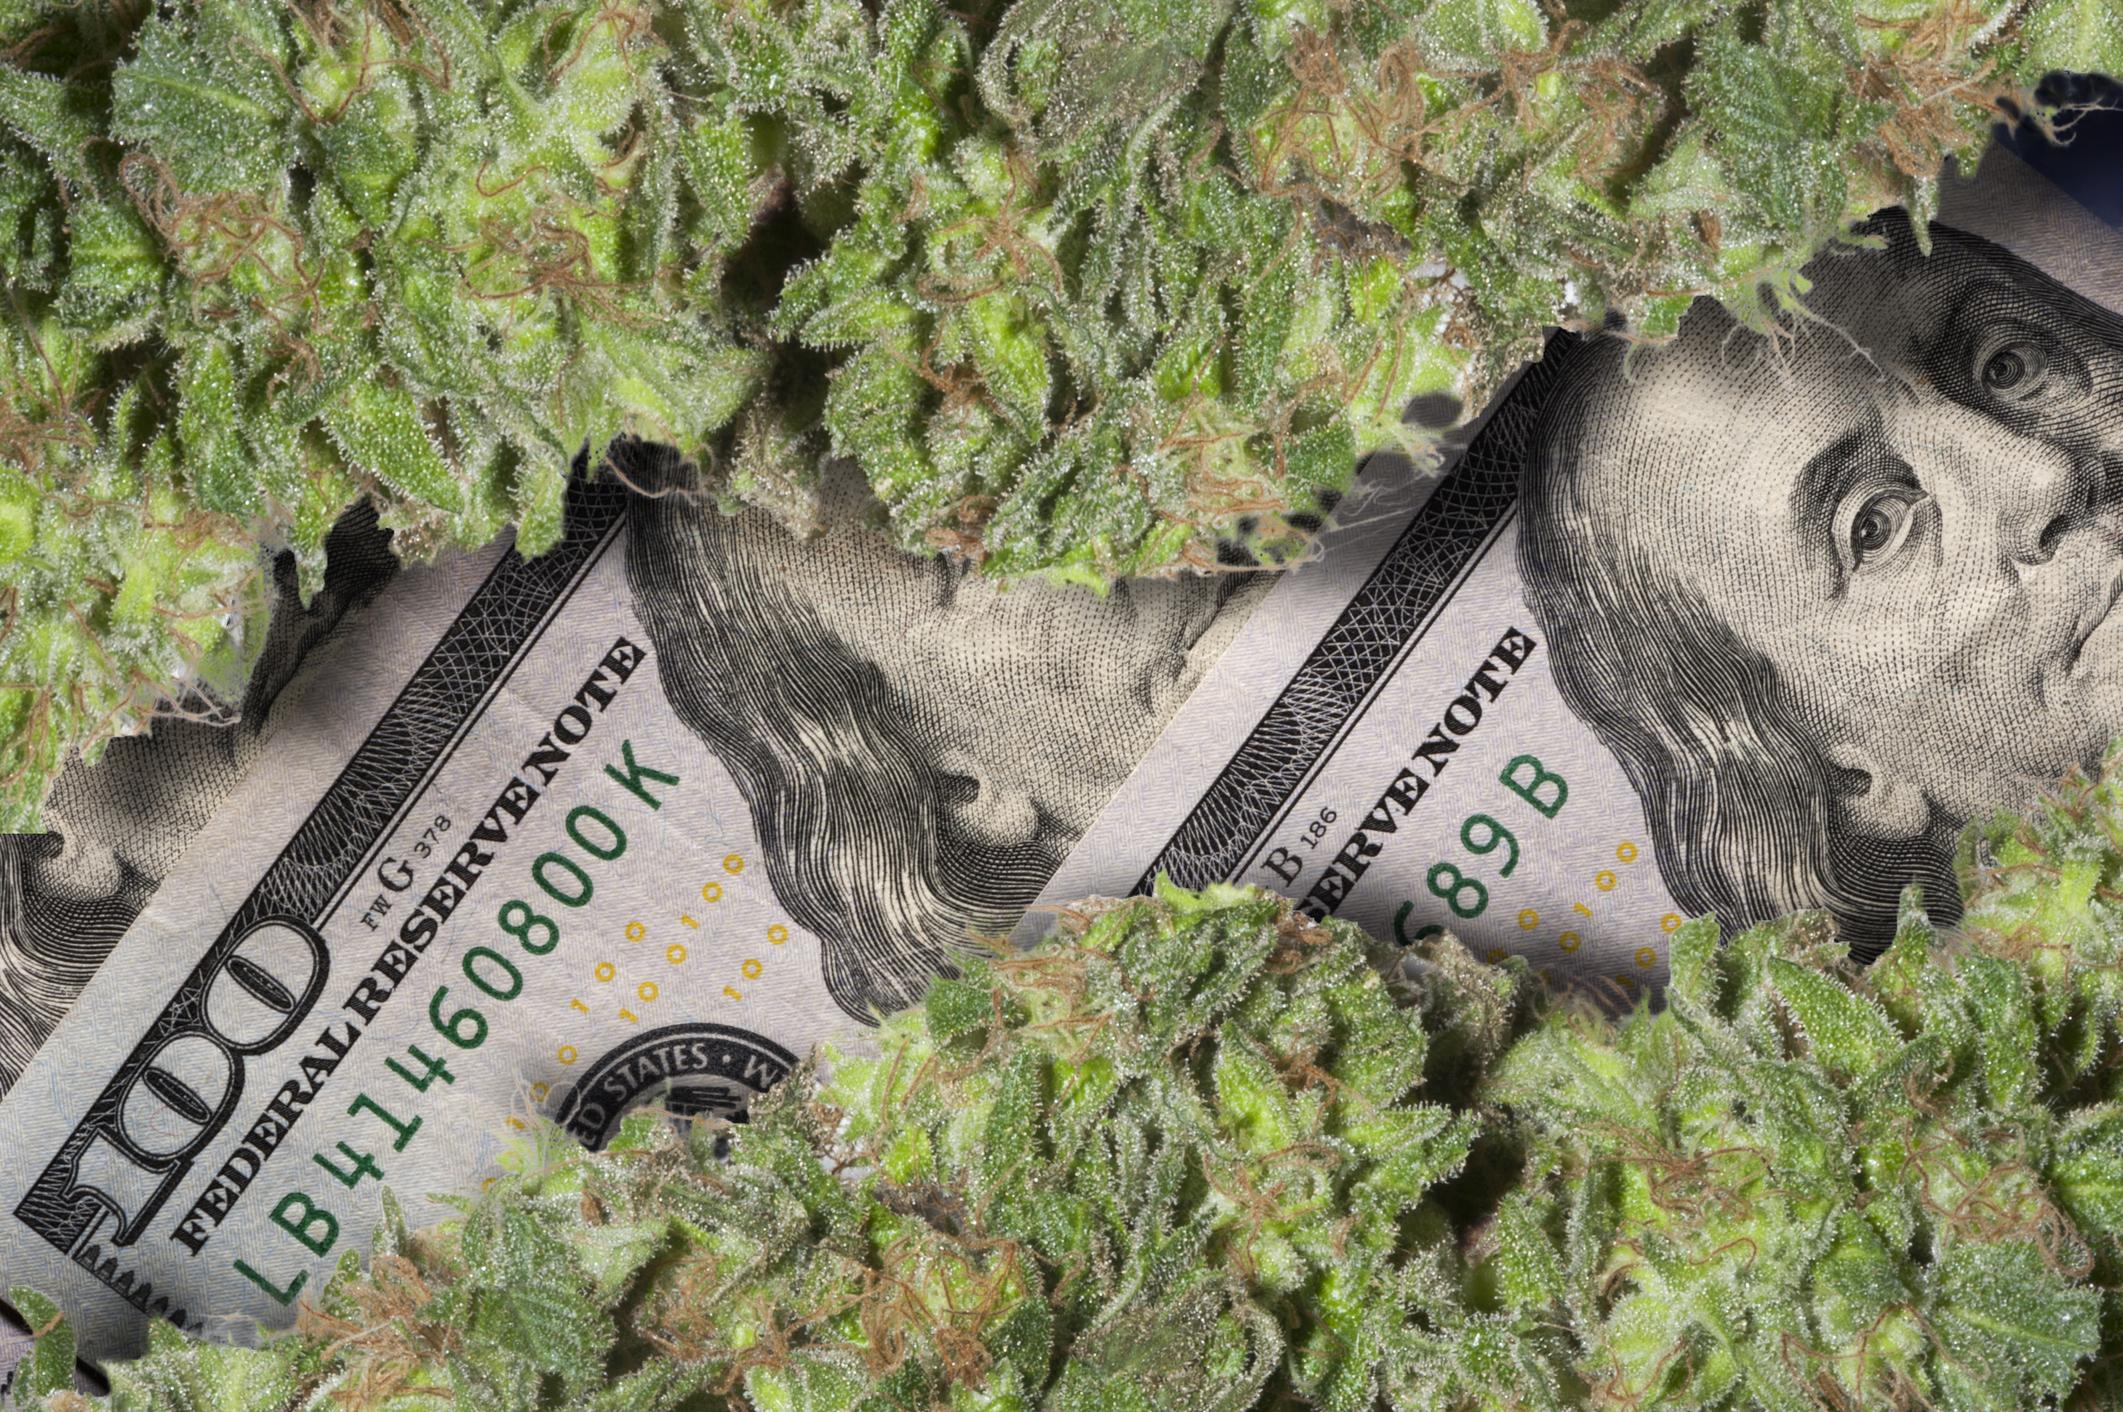 Marijuana on hundred-dollar bills.